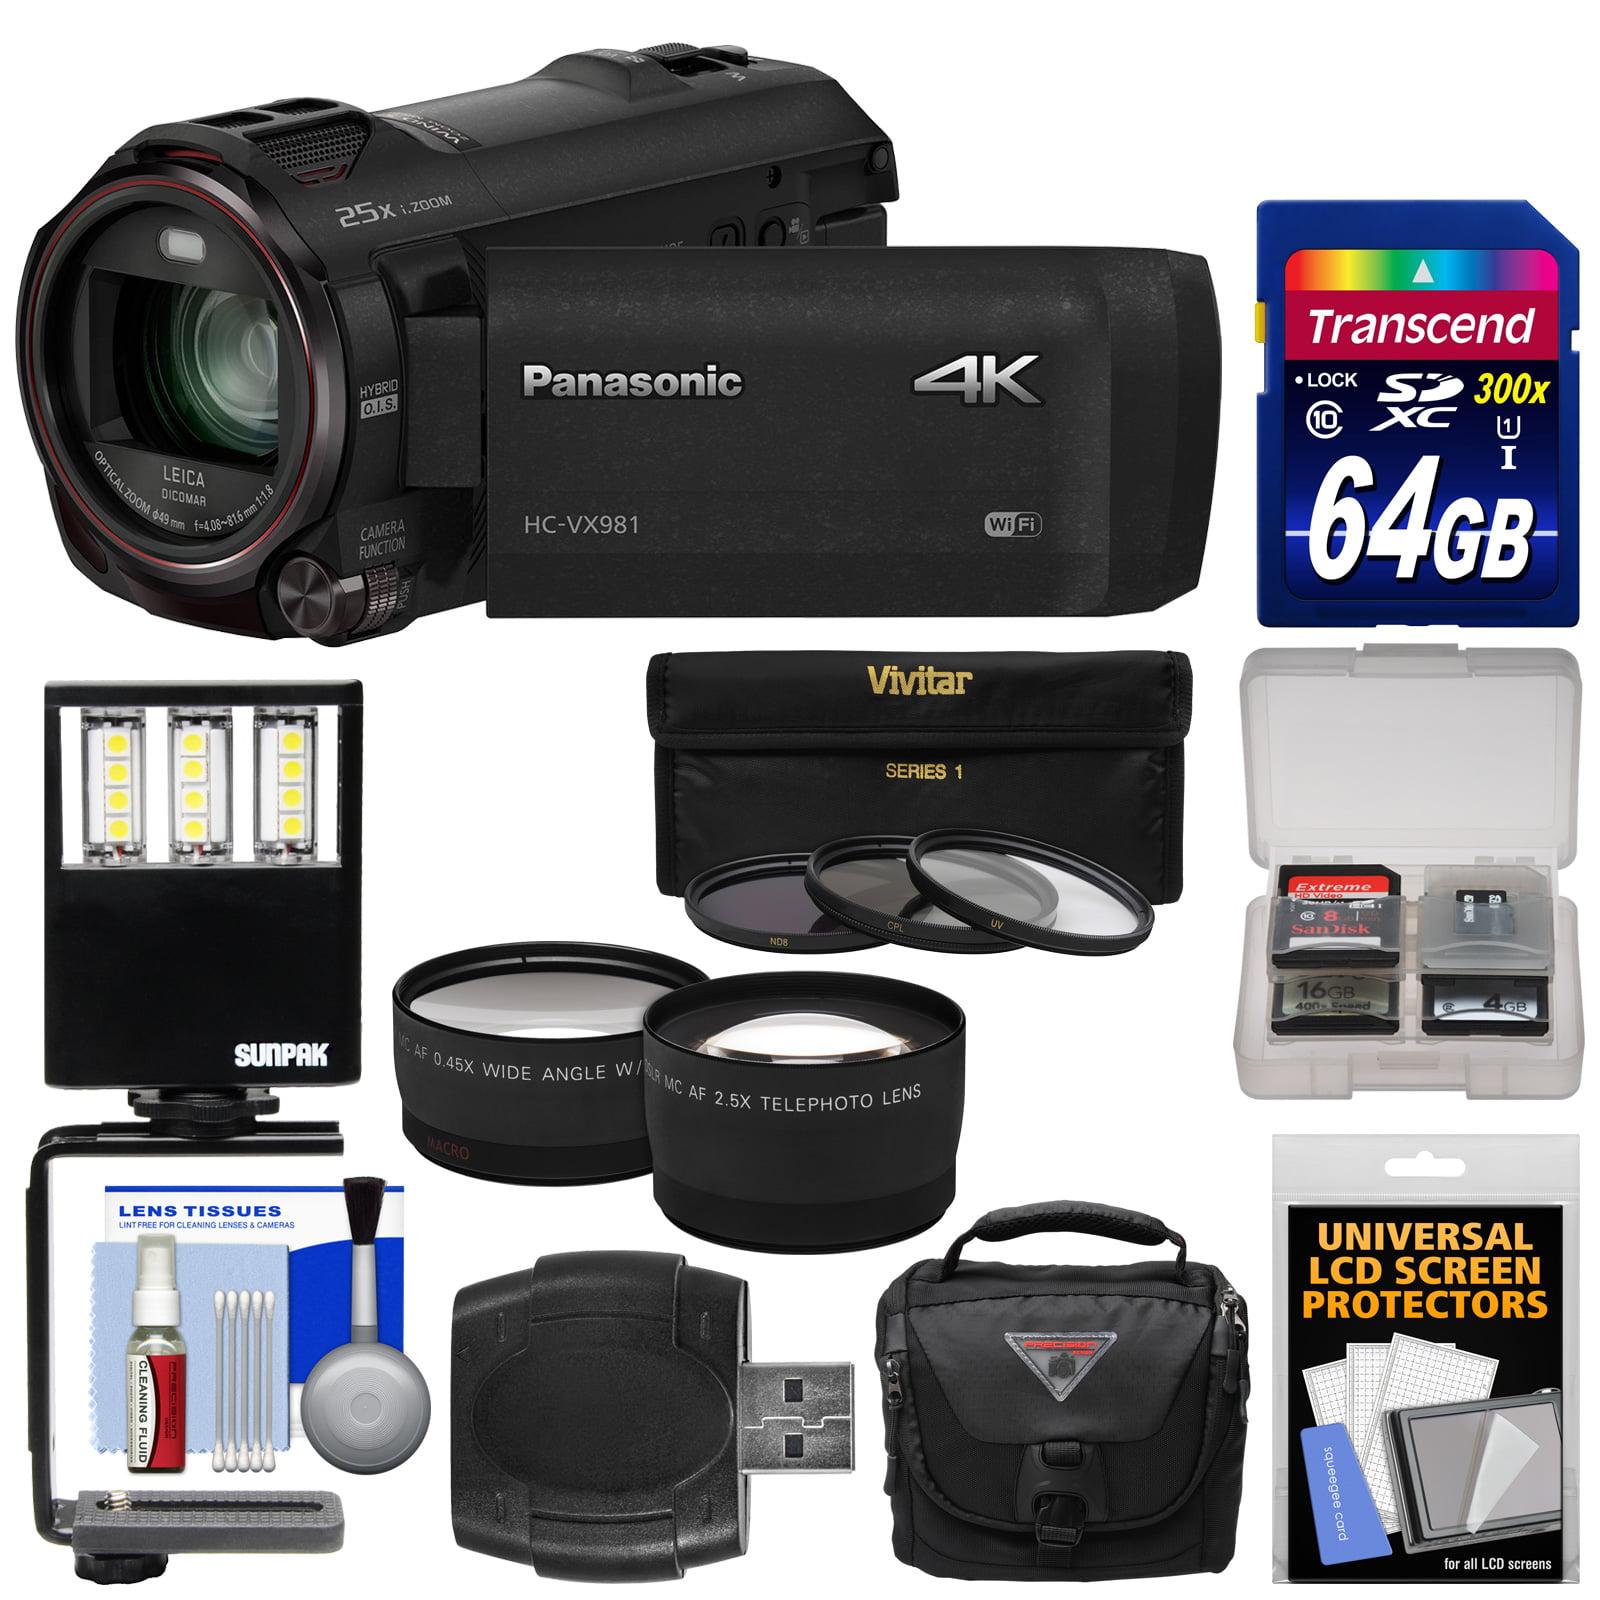 Panasonic HC-VX981 Wi-Fi 4K Ultra HD Video Camera Camcorder with 64GB Card + Case + LED Light + 3 Filters + Tele/Wide Lens Kit